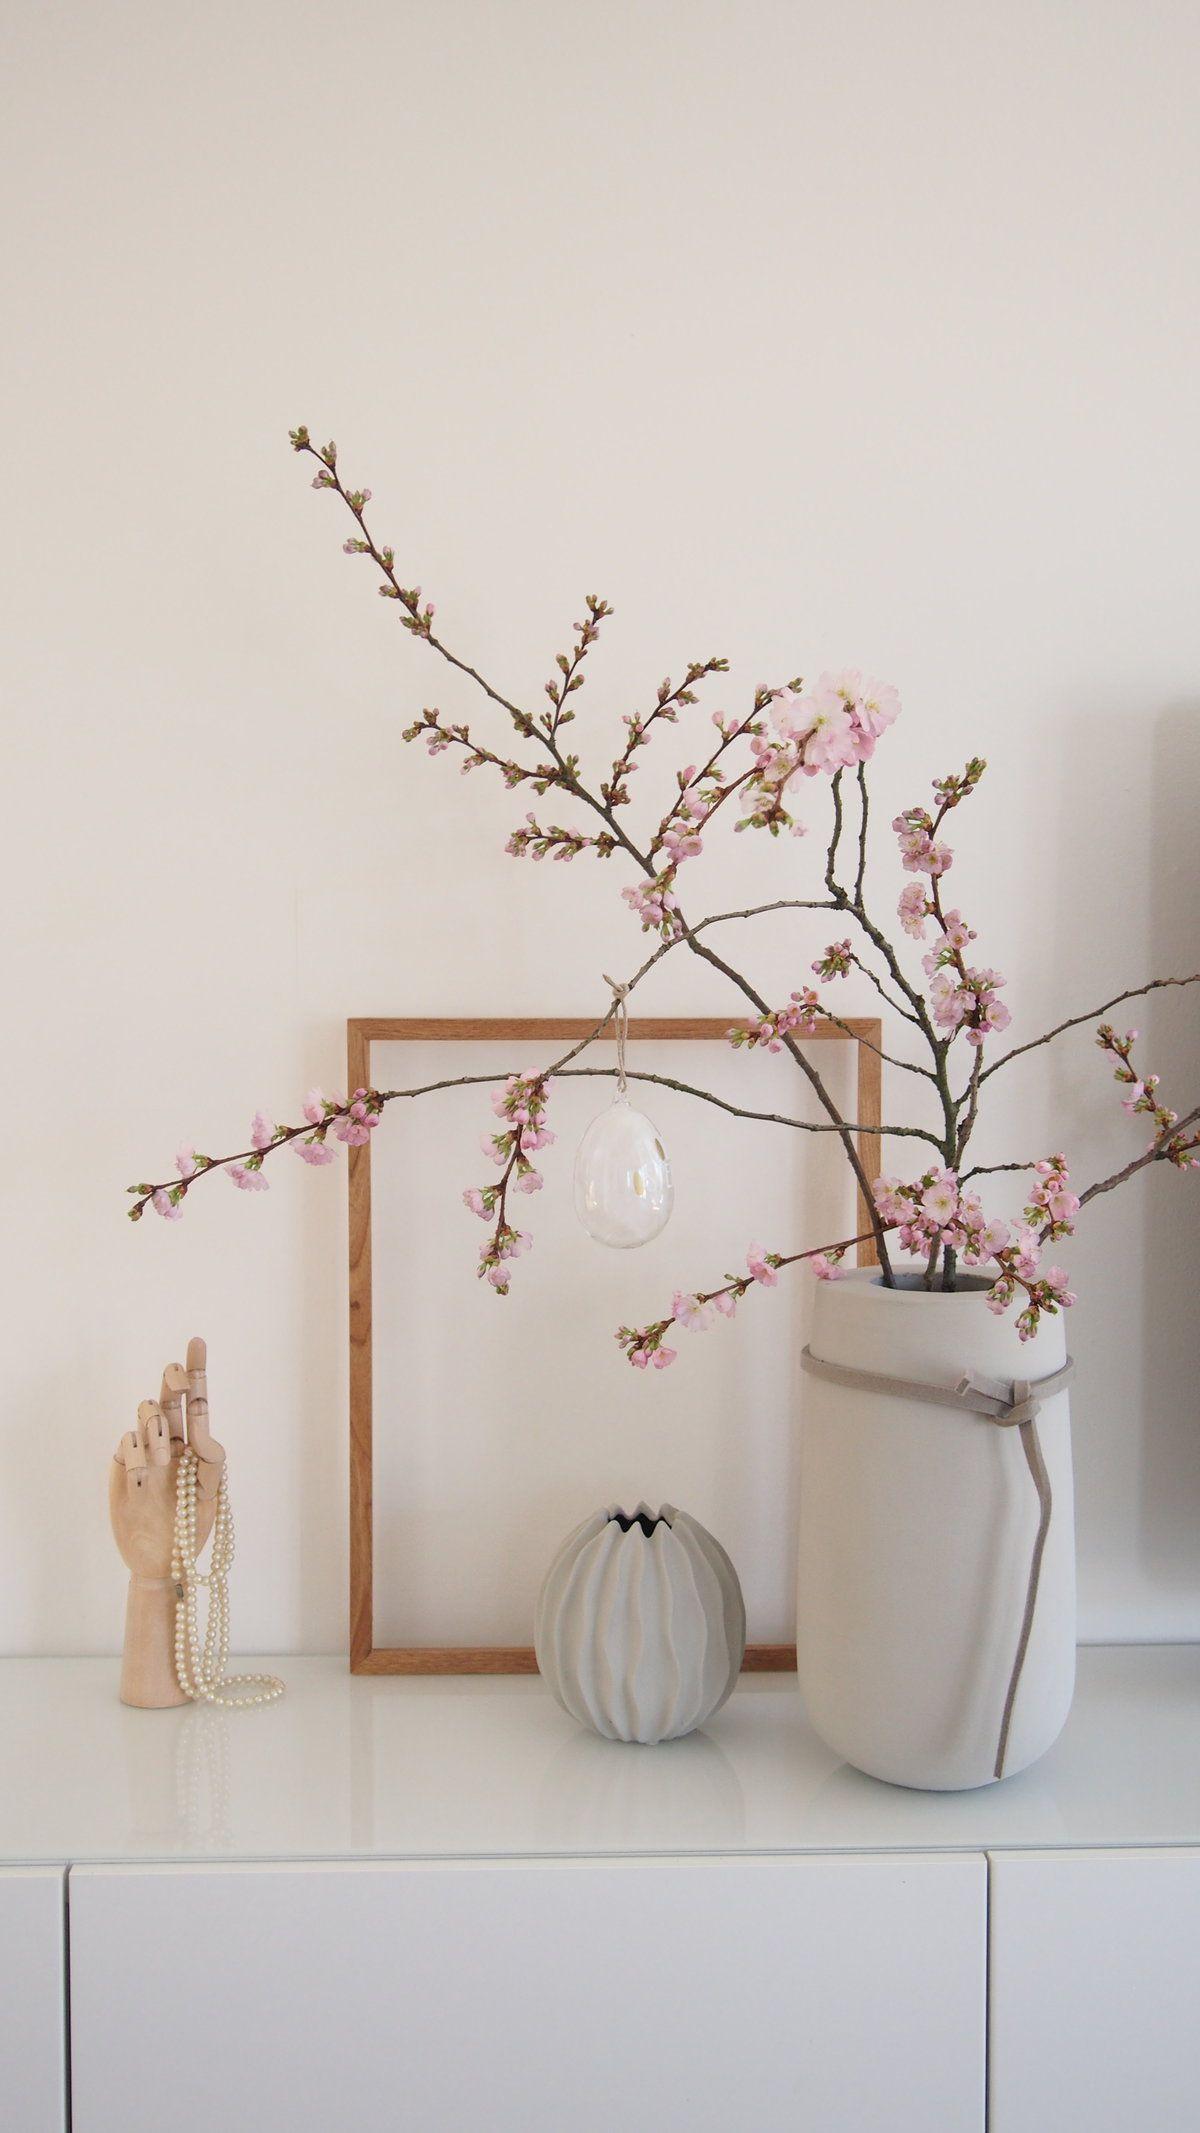 ikea besta source so leb ich sch nes f r zu hause pinterest decor home decor and home. Black Bedroom Furniture Sets. Home Design Ideas